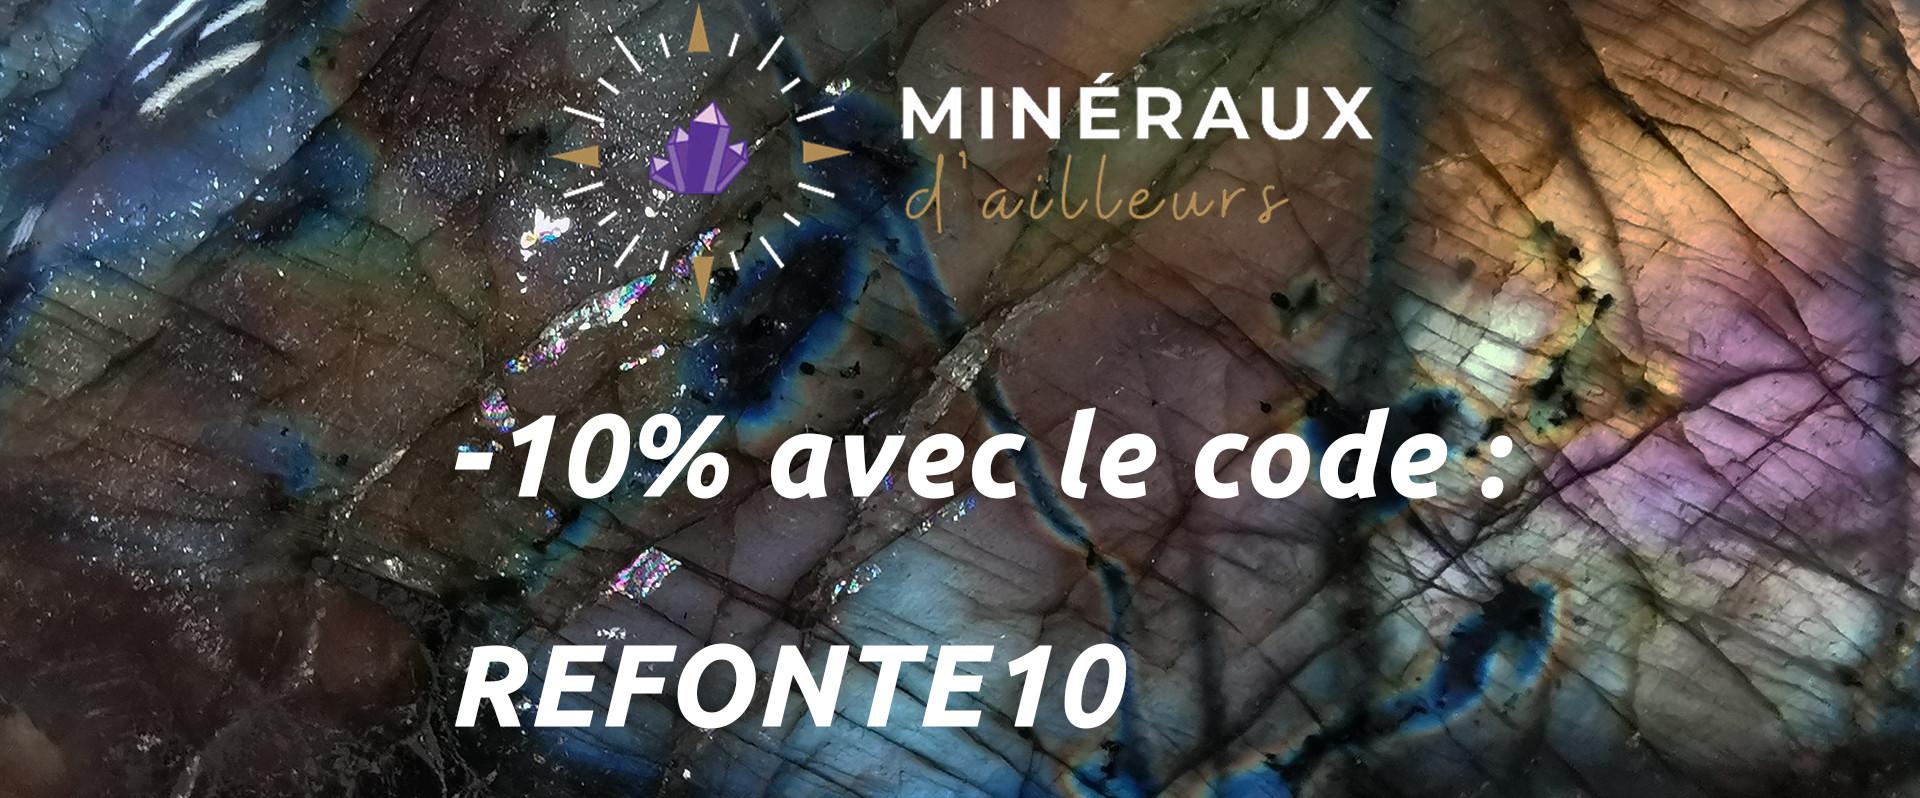 Code promo , -10% avec le code : REFONTE10